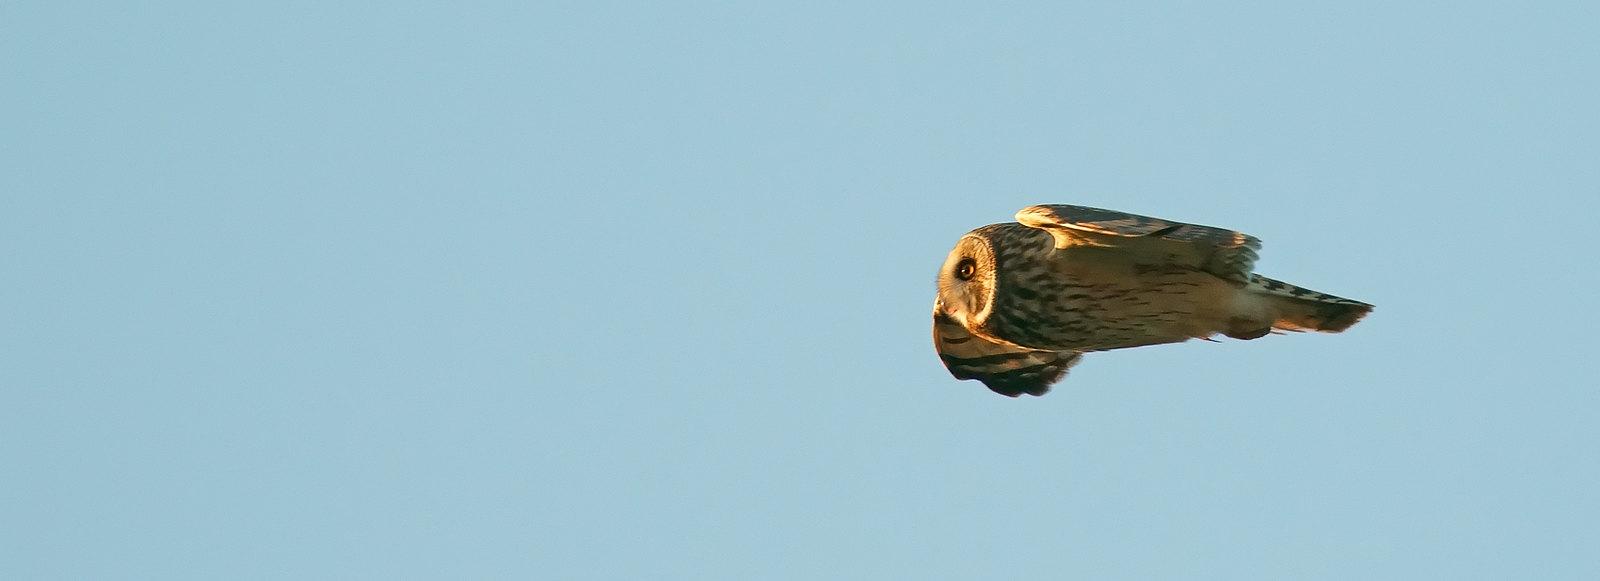 Short-eared Owl - like a bullet